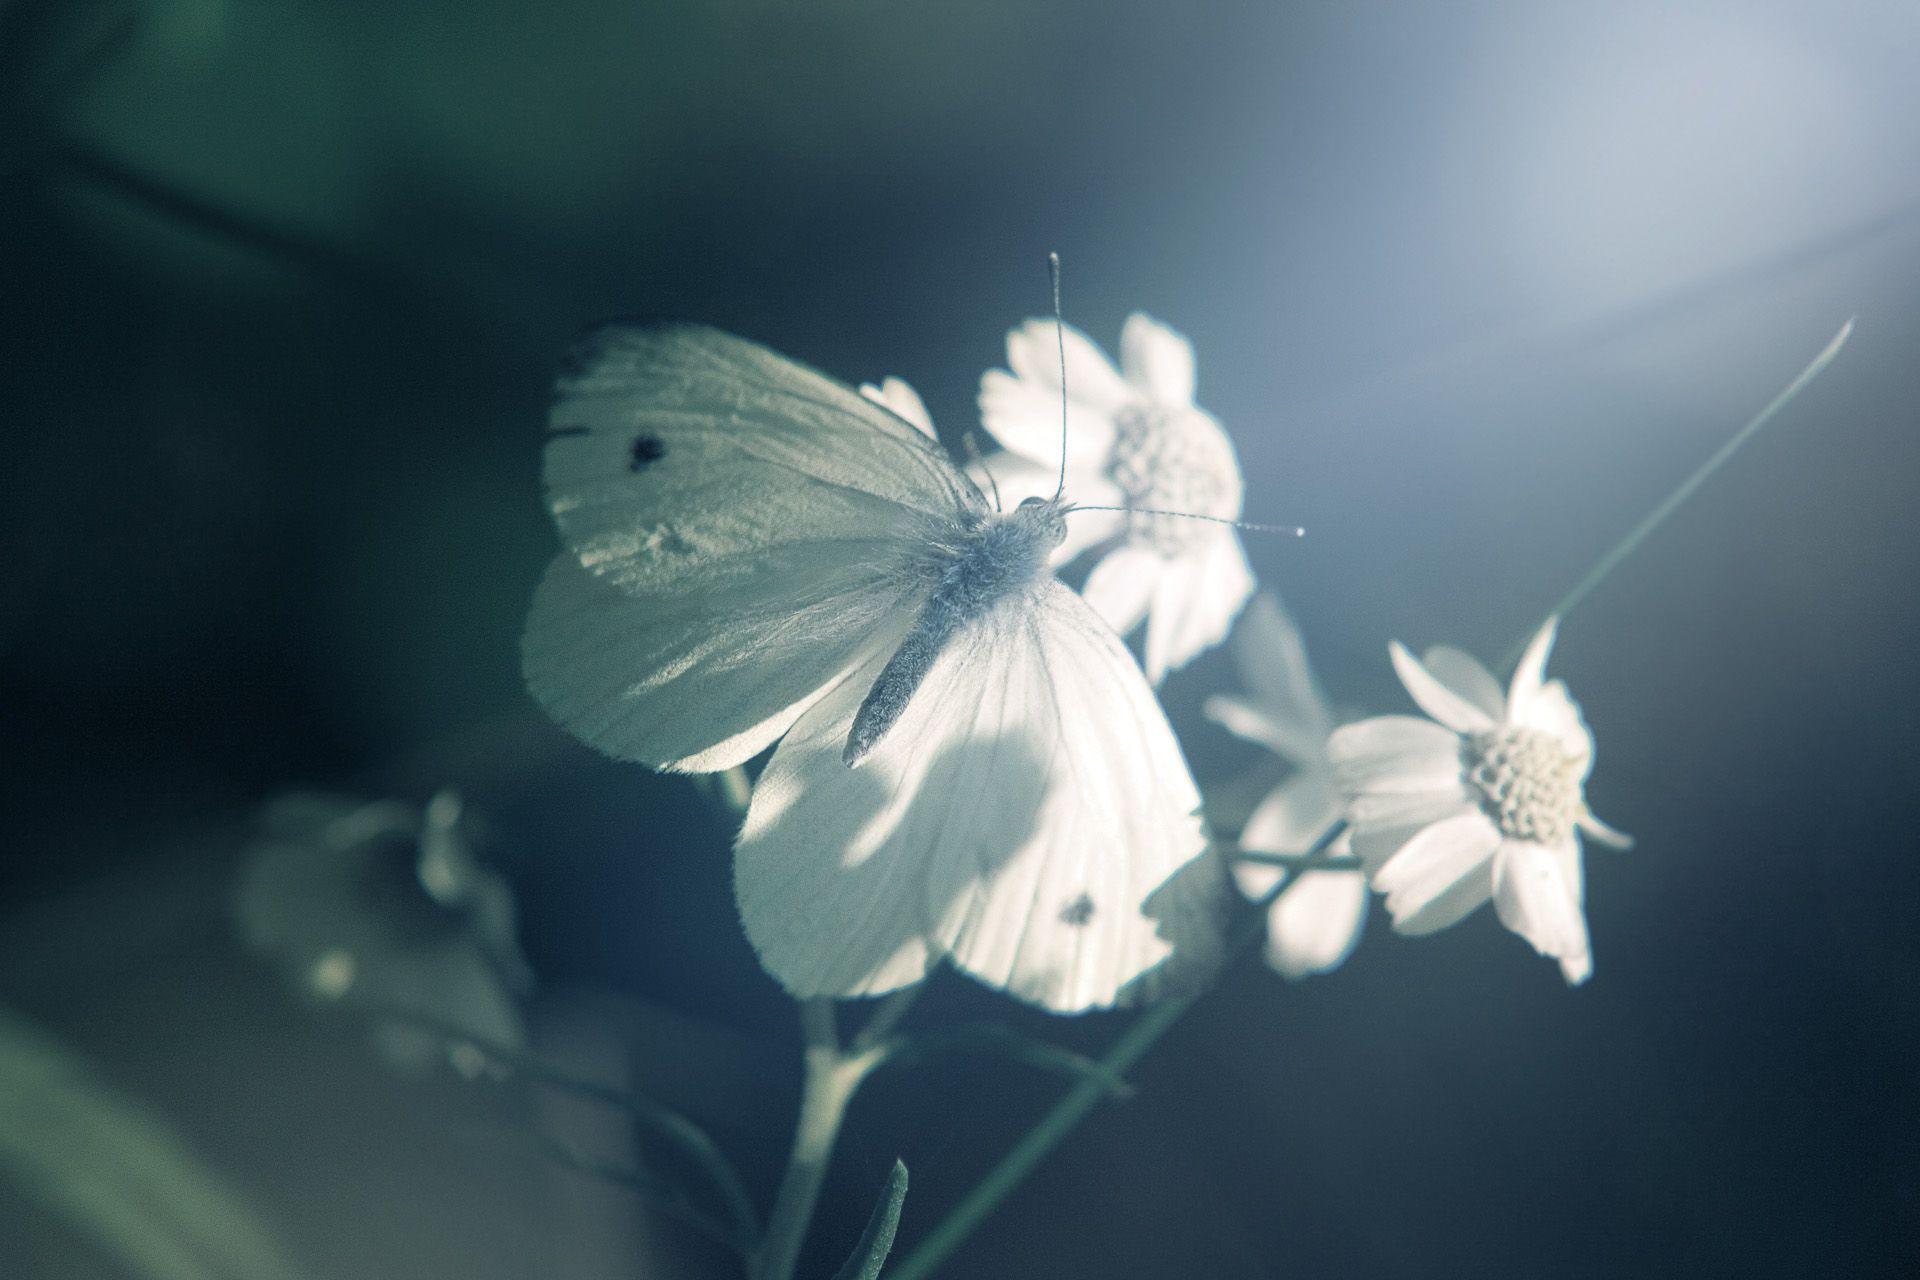 бабочка фото картинки для детей